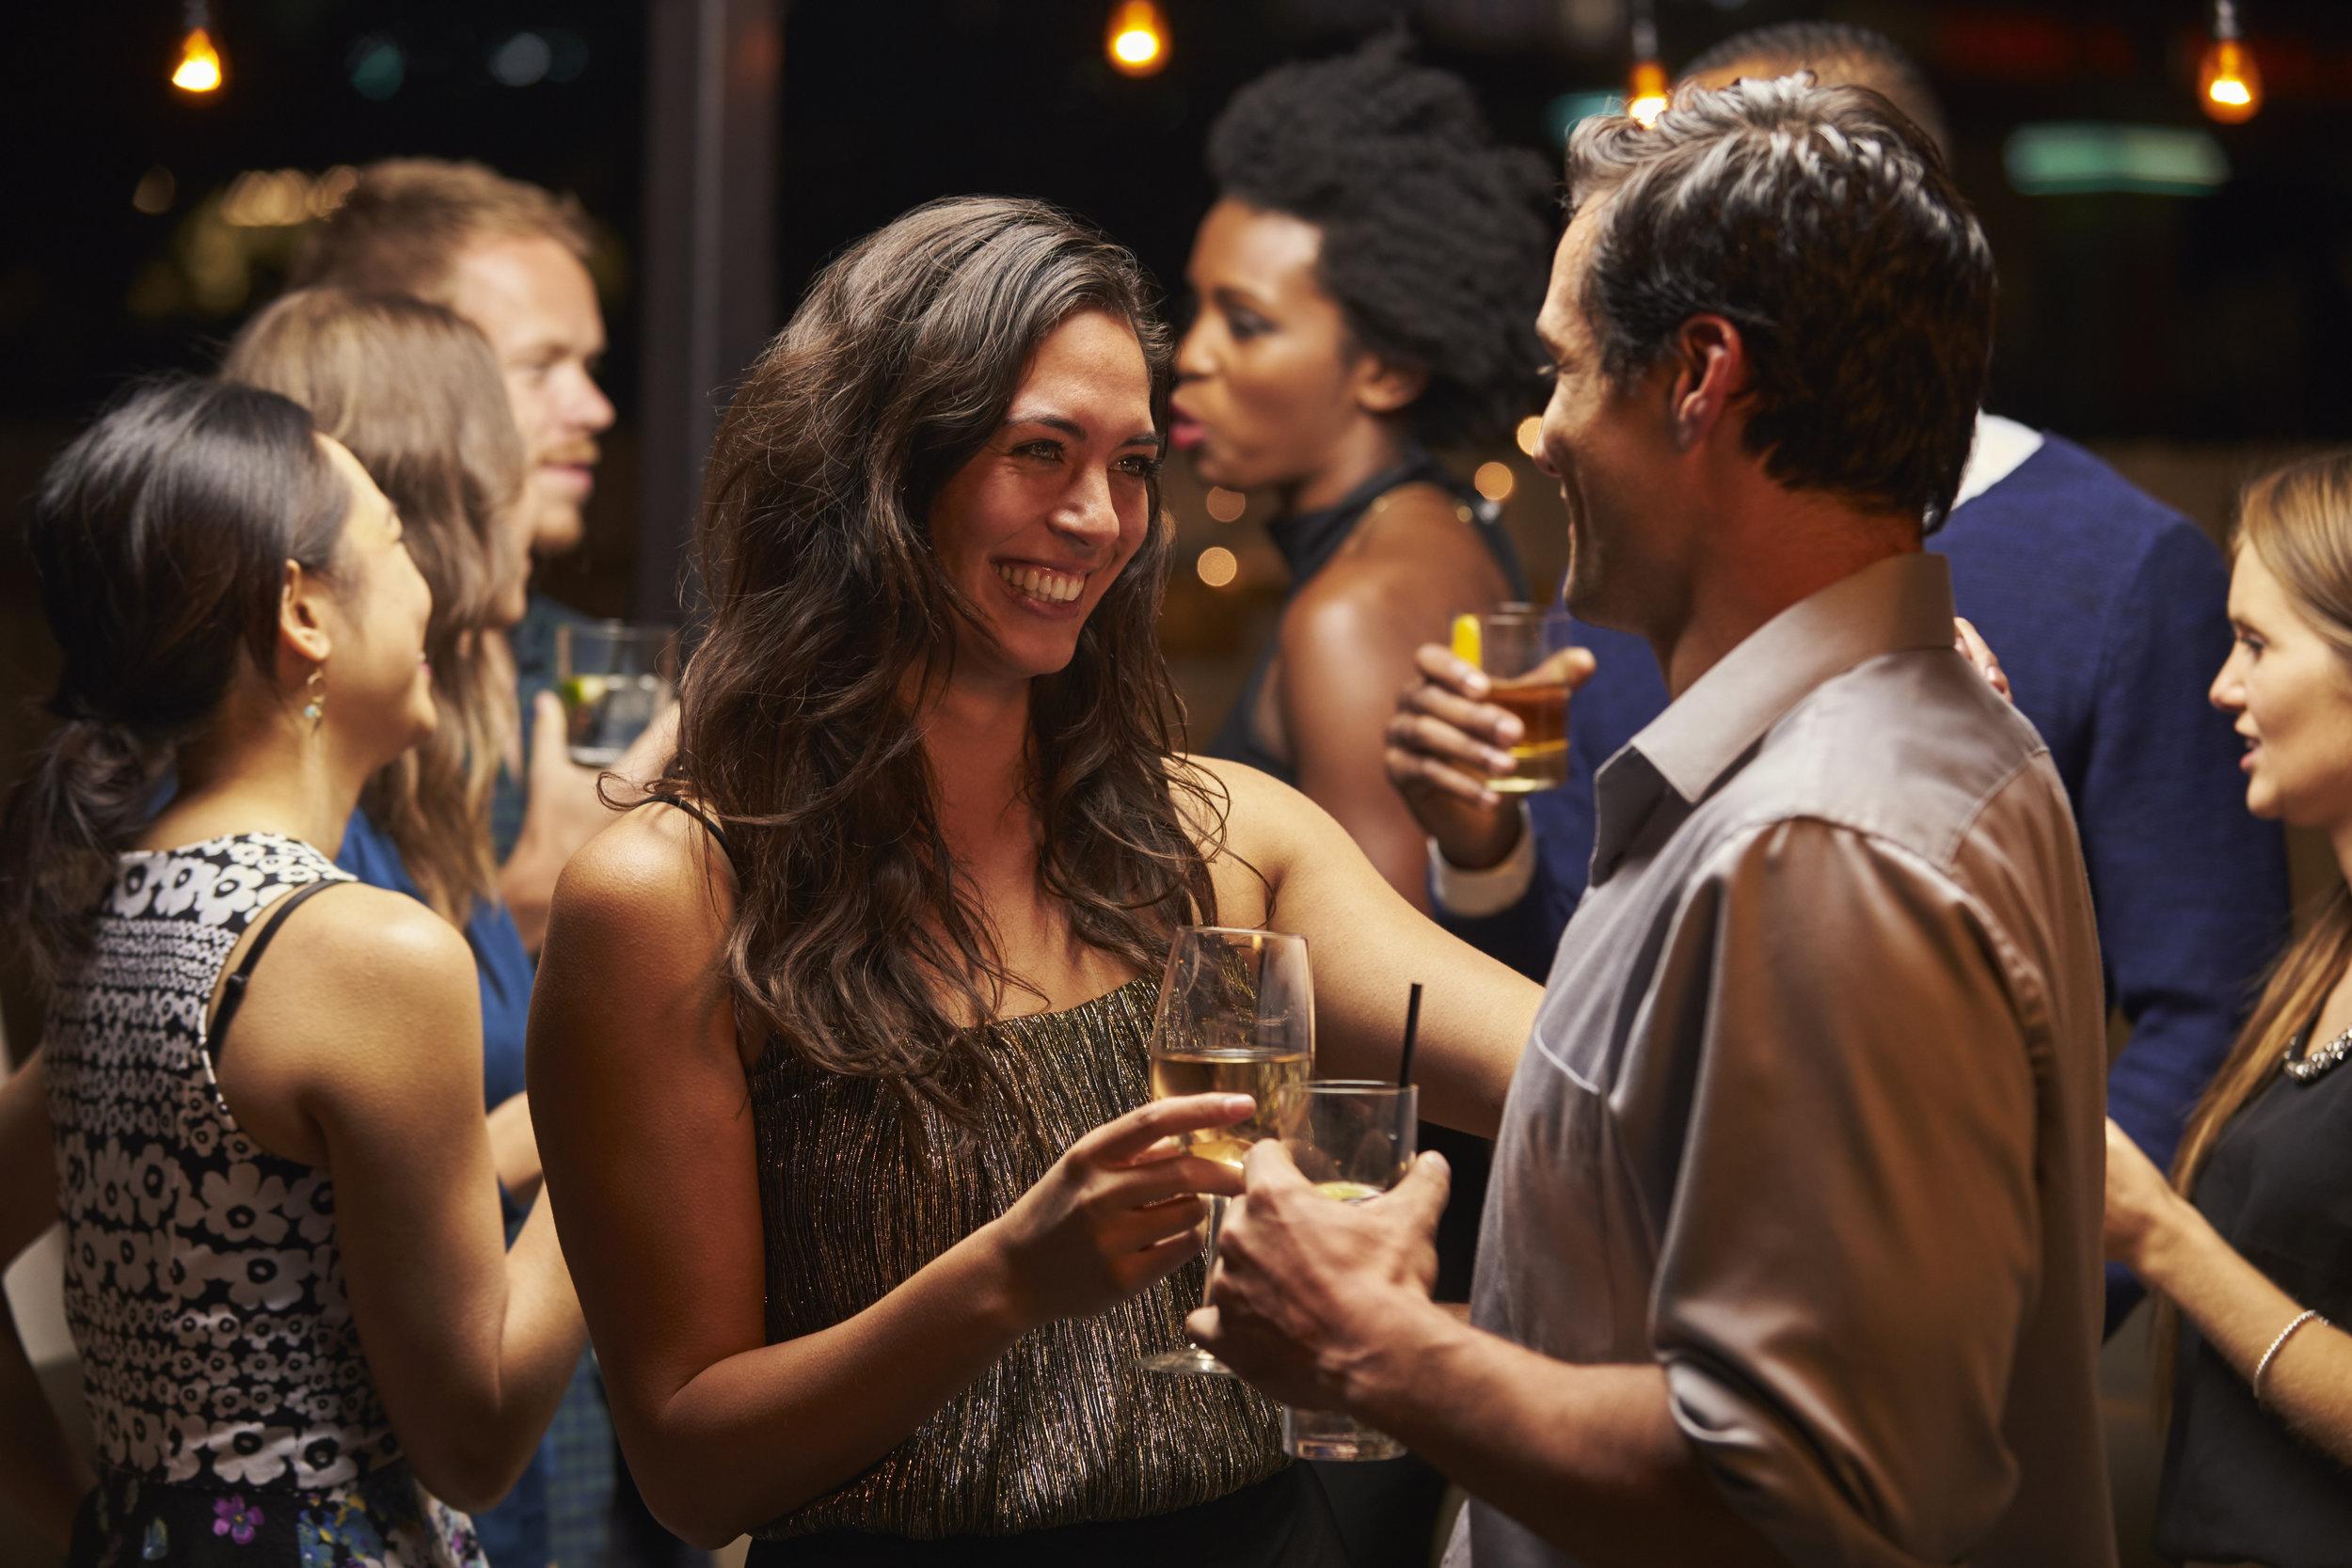 Singler dating events dublin